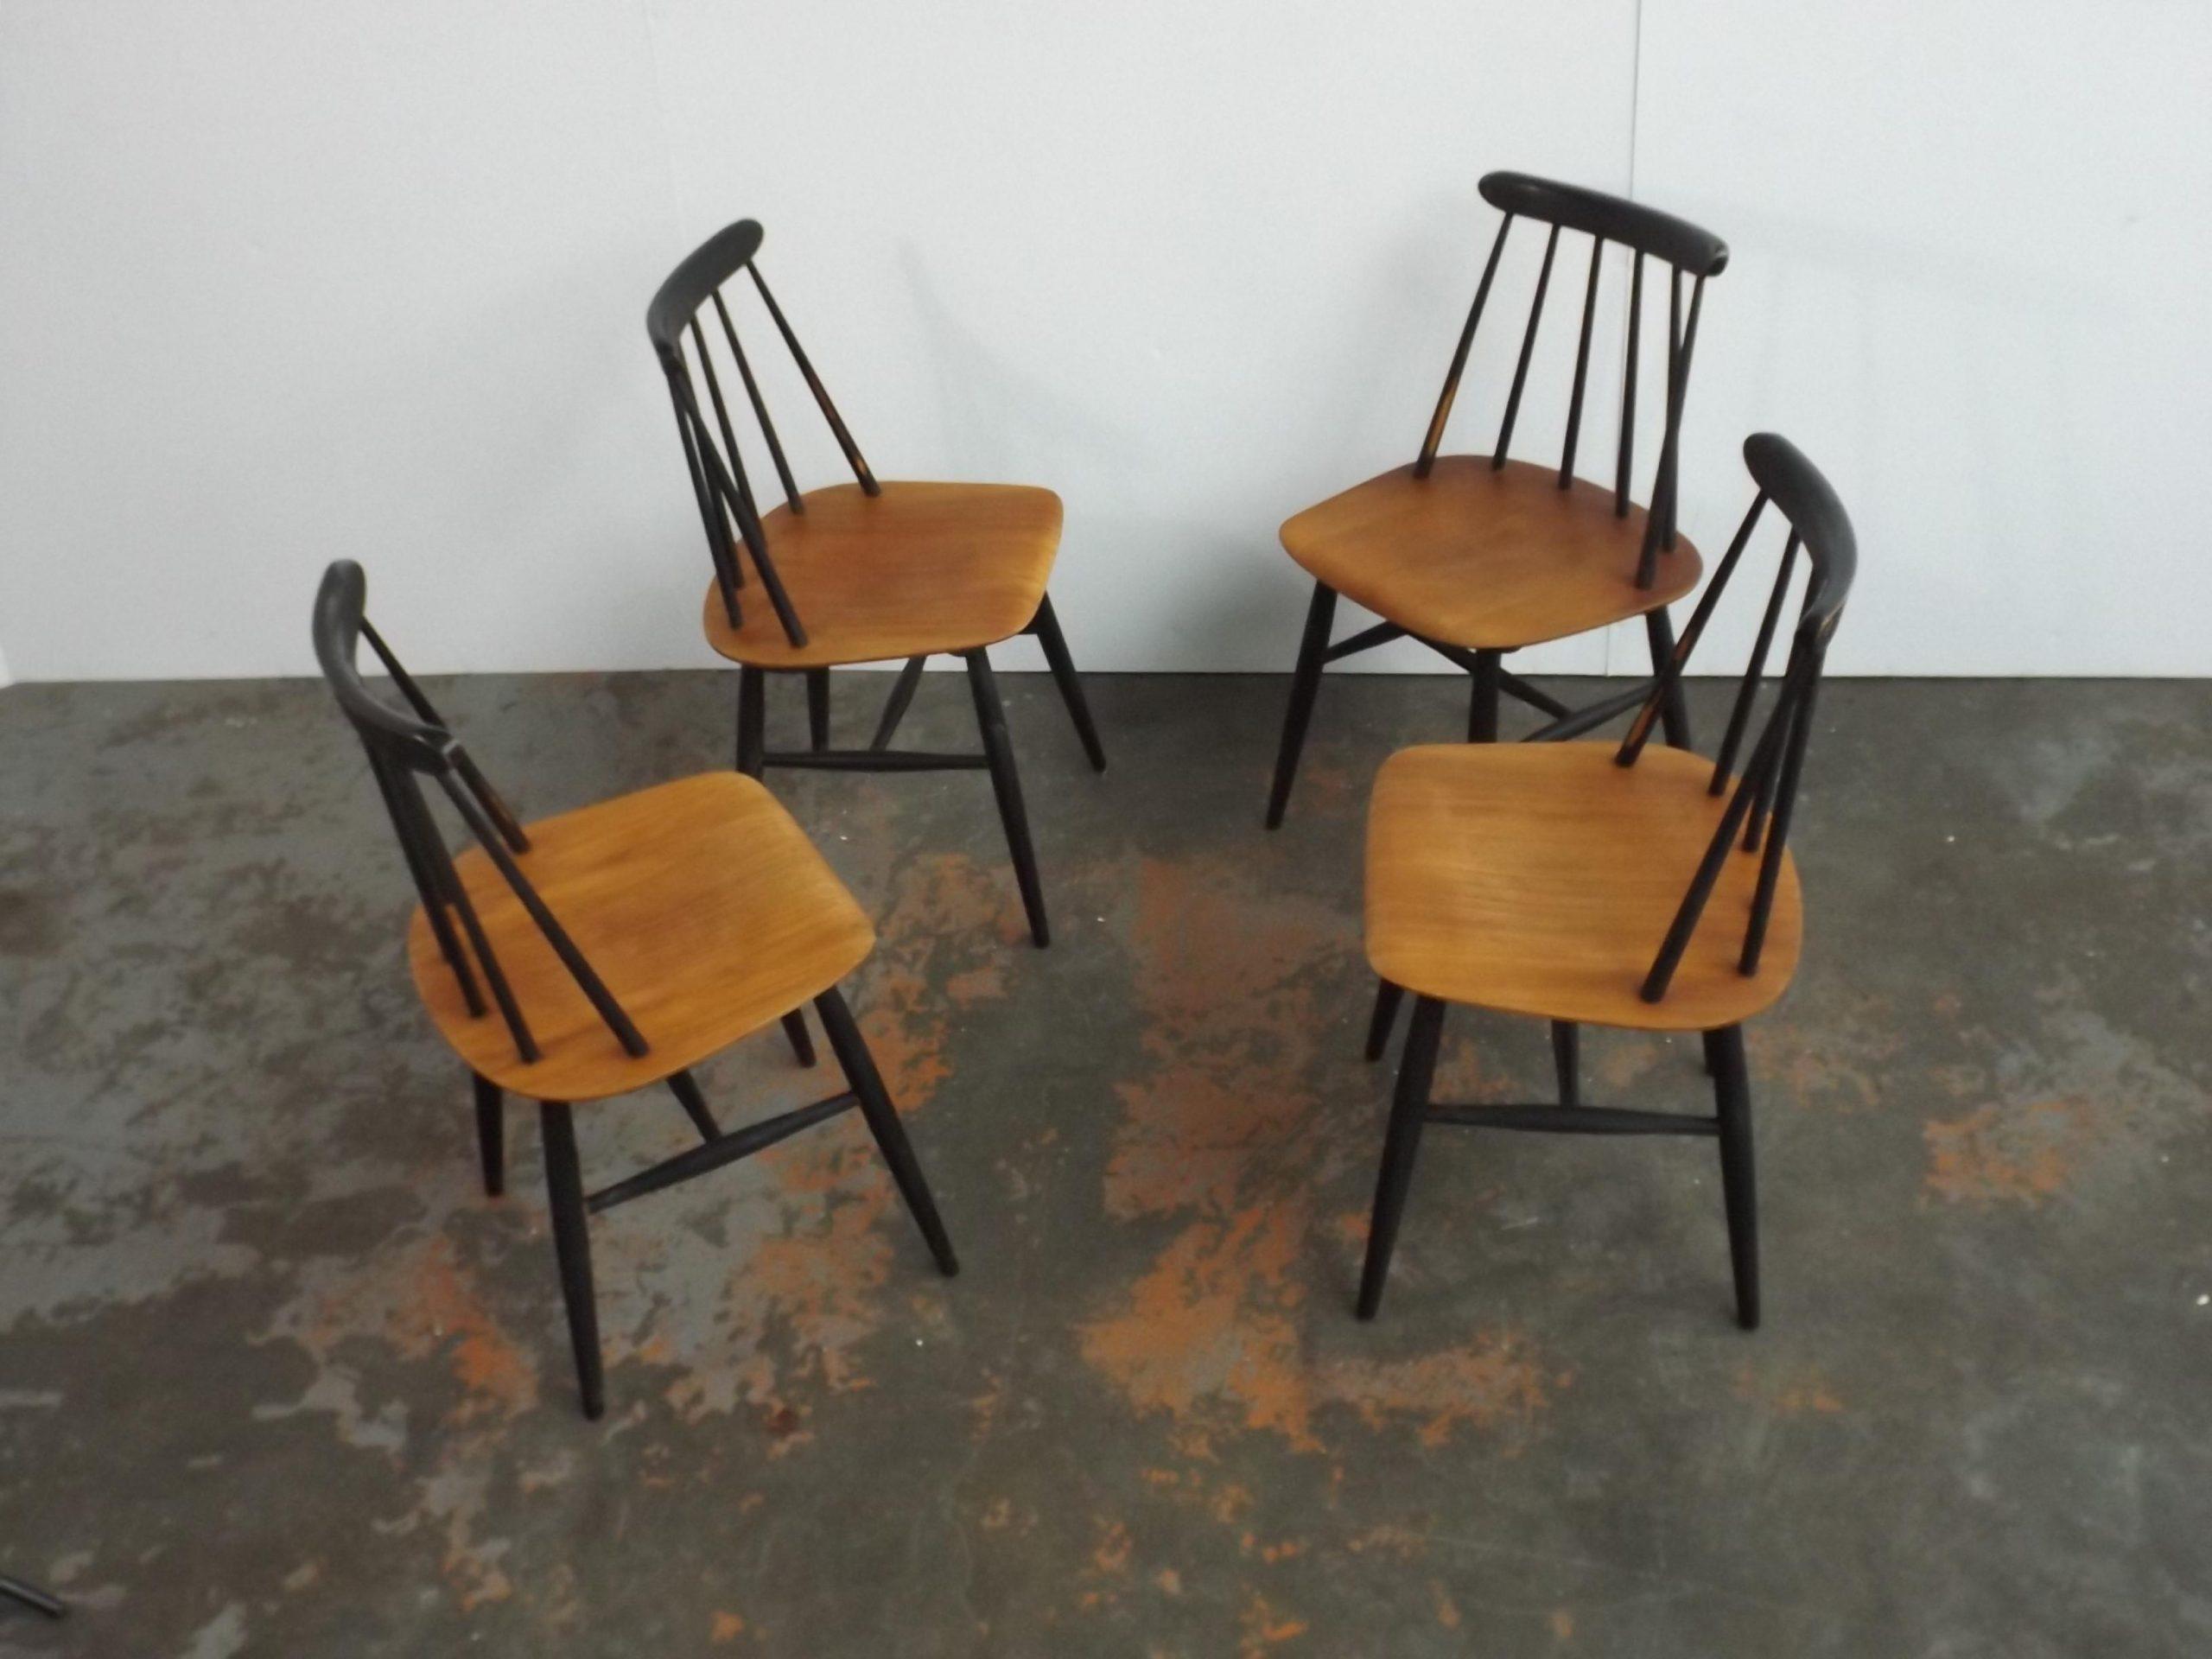 Fanett diner chairs